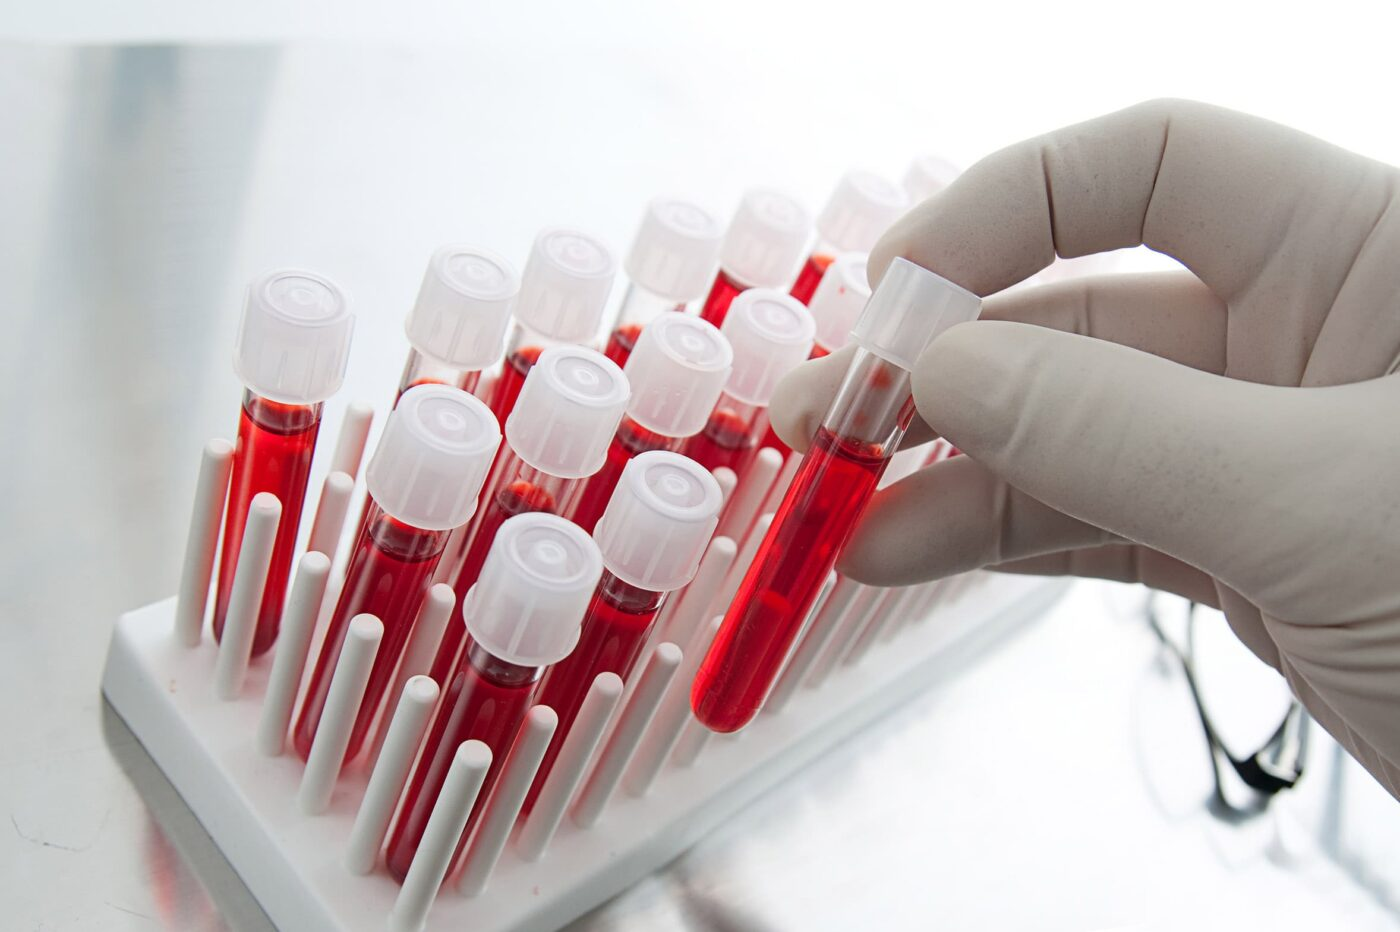 Анализ крови на ИППП